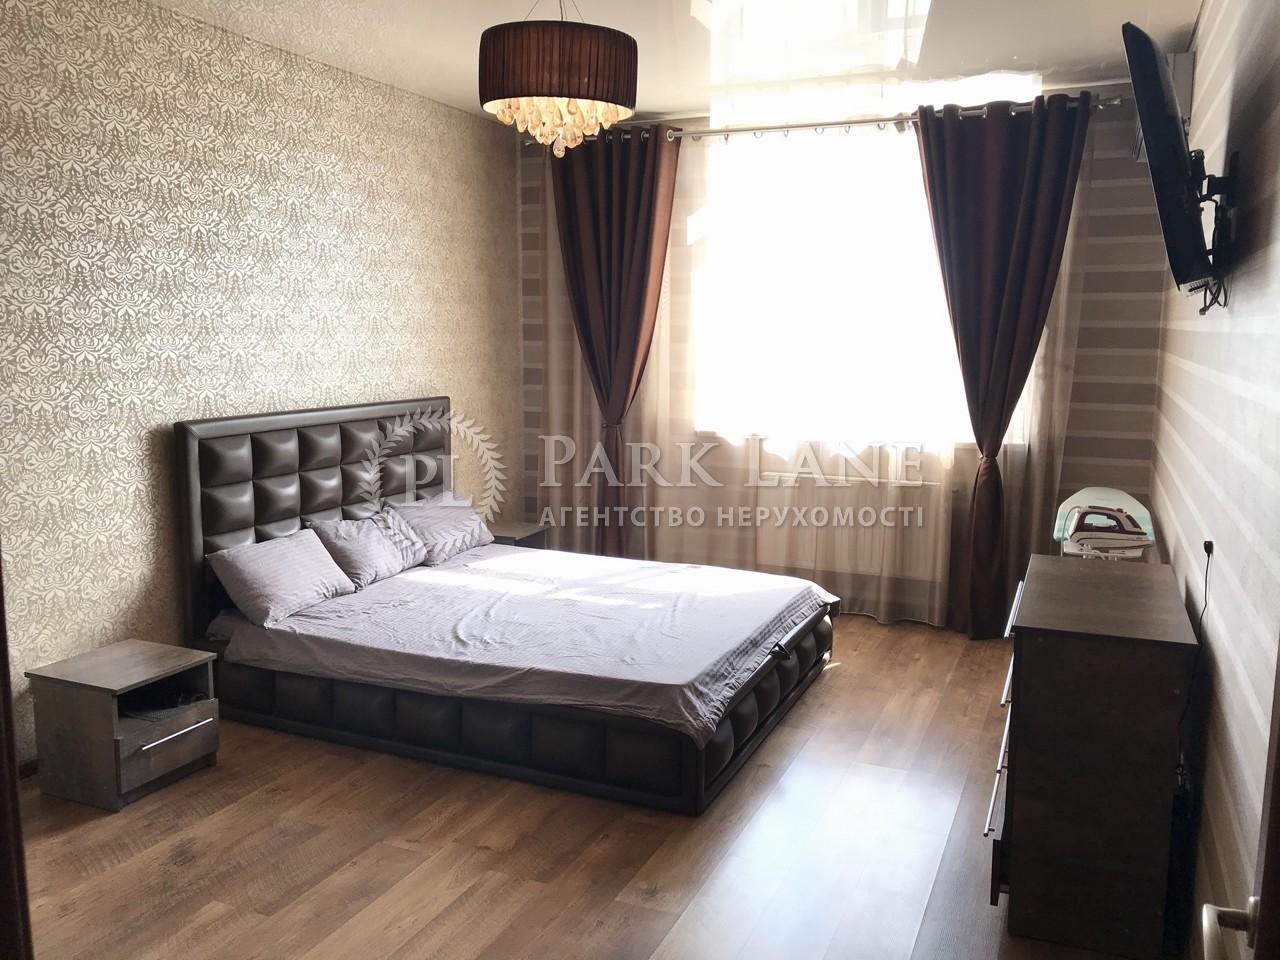 Квартира ул. Саперно-Слободская, 24, Киев, K-30568 - Фото 5